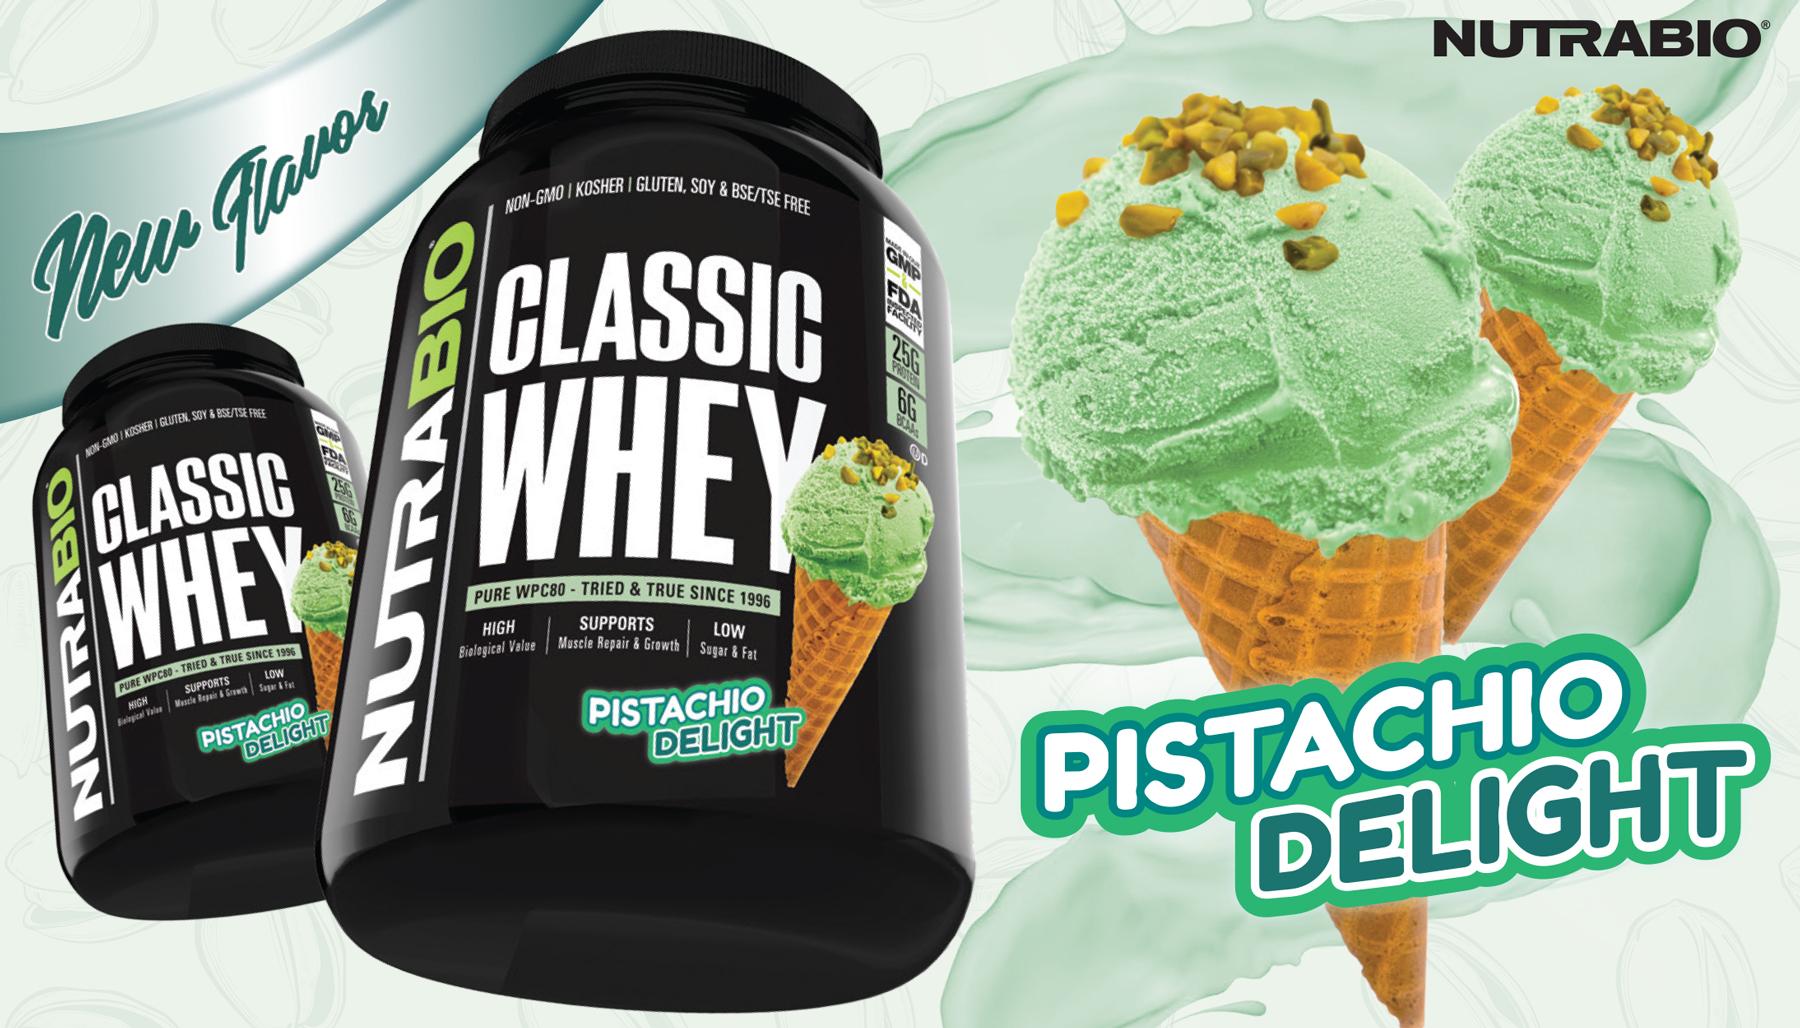 Pistachio Delight Classic Whey Starts NutraBio's Ice Cream Parlor Series!